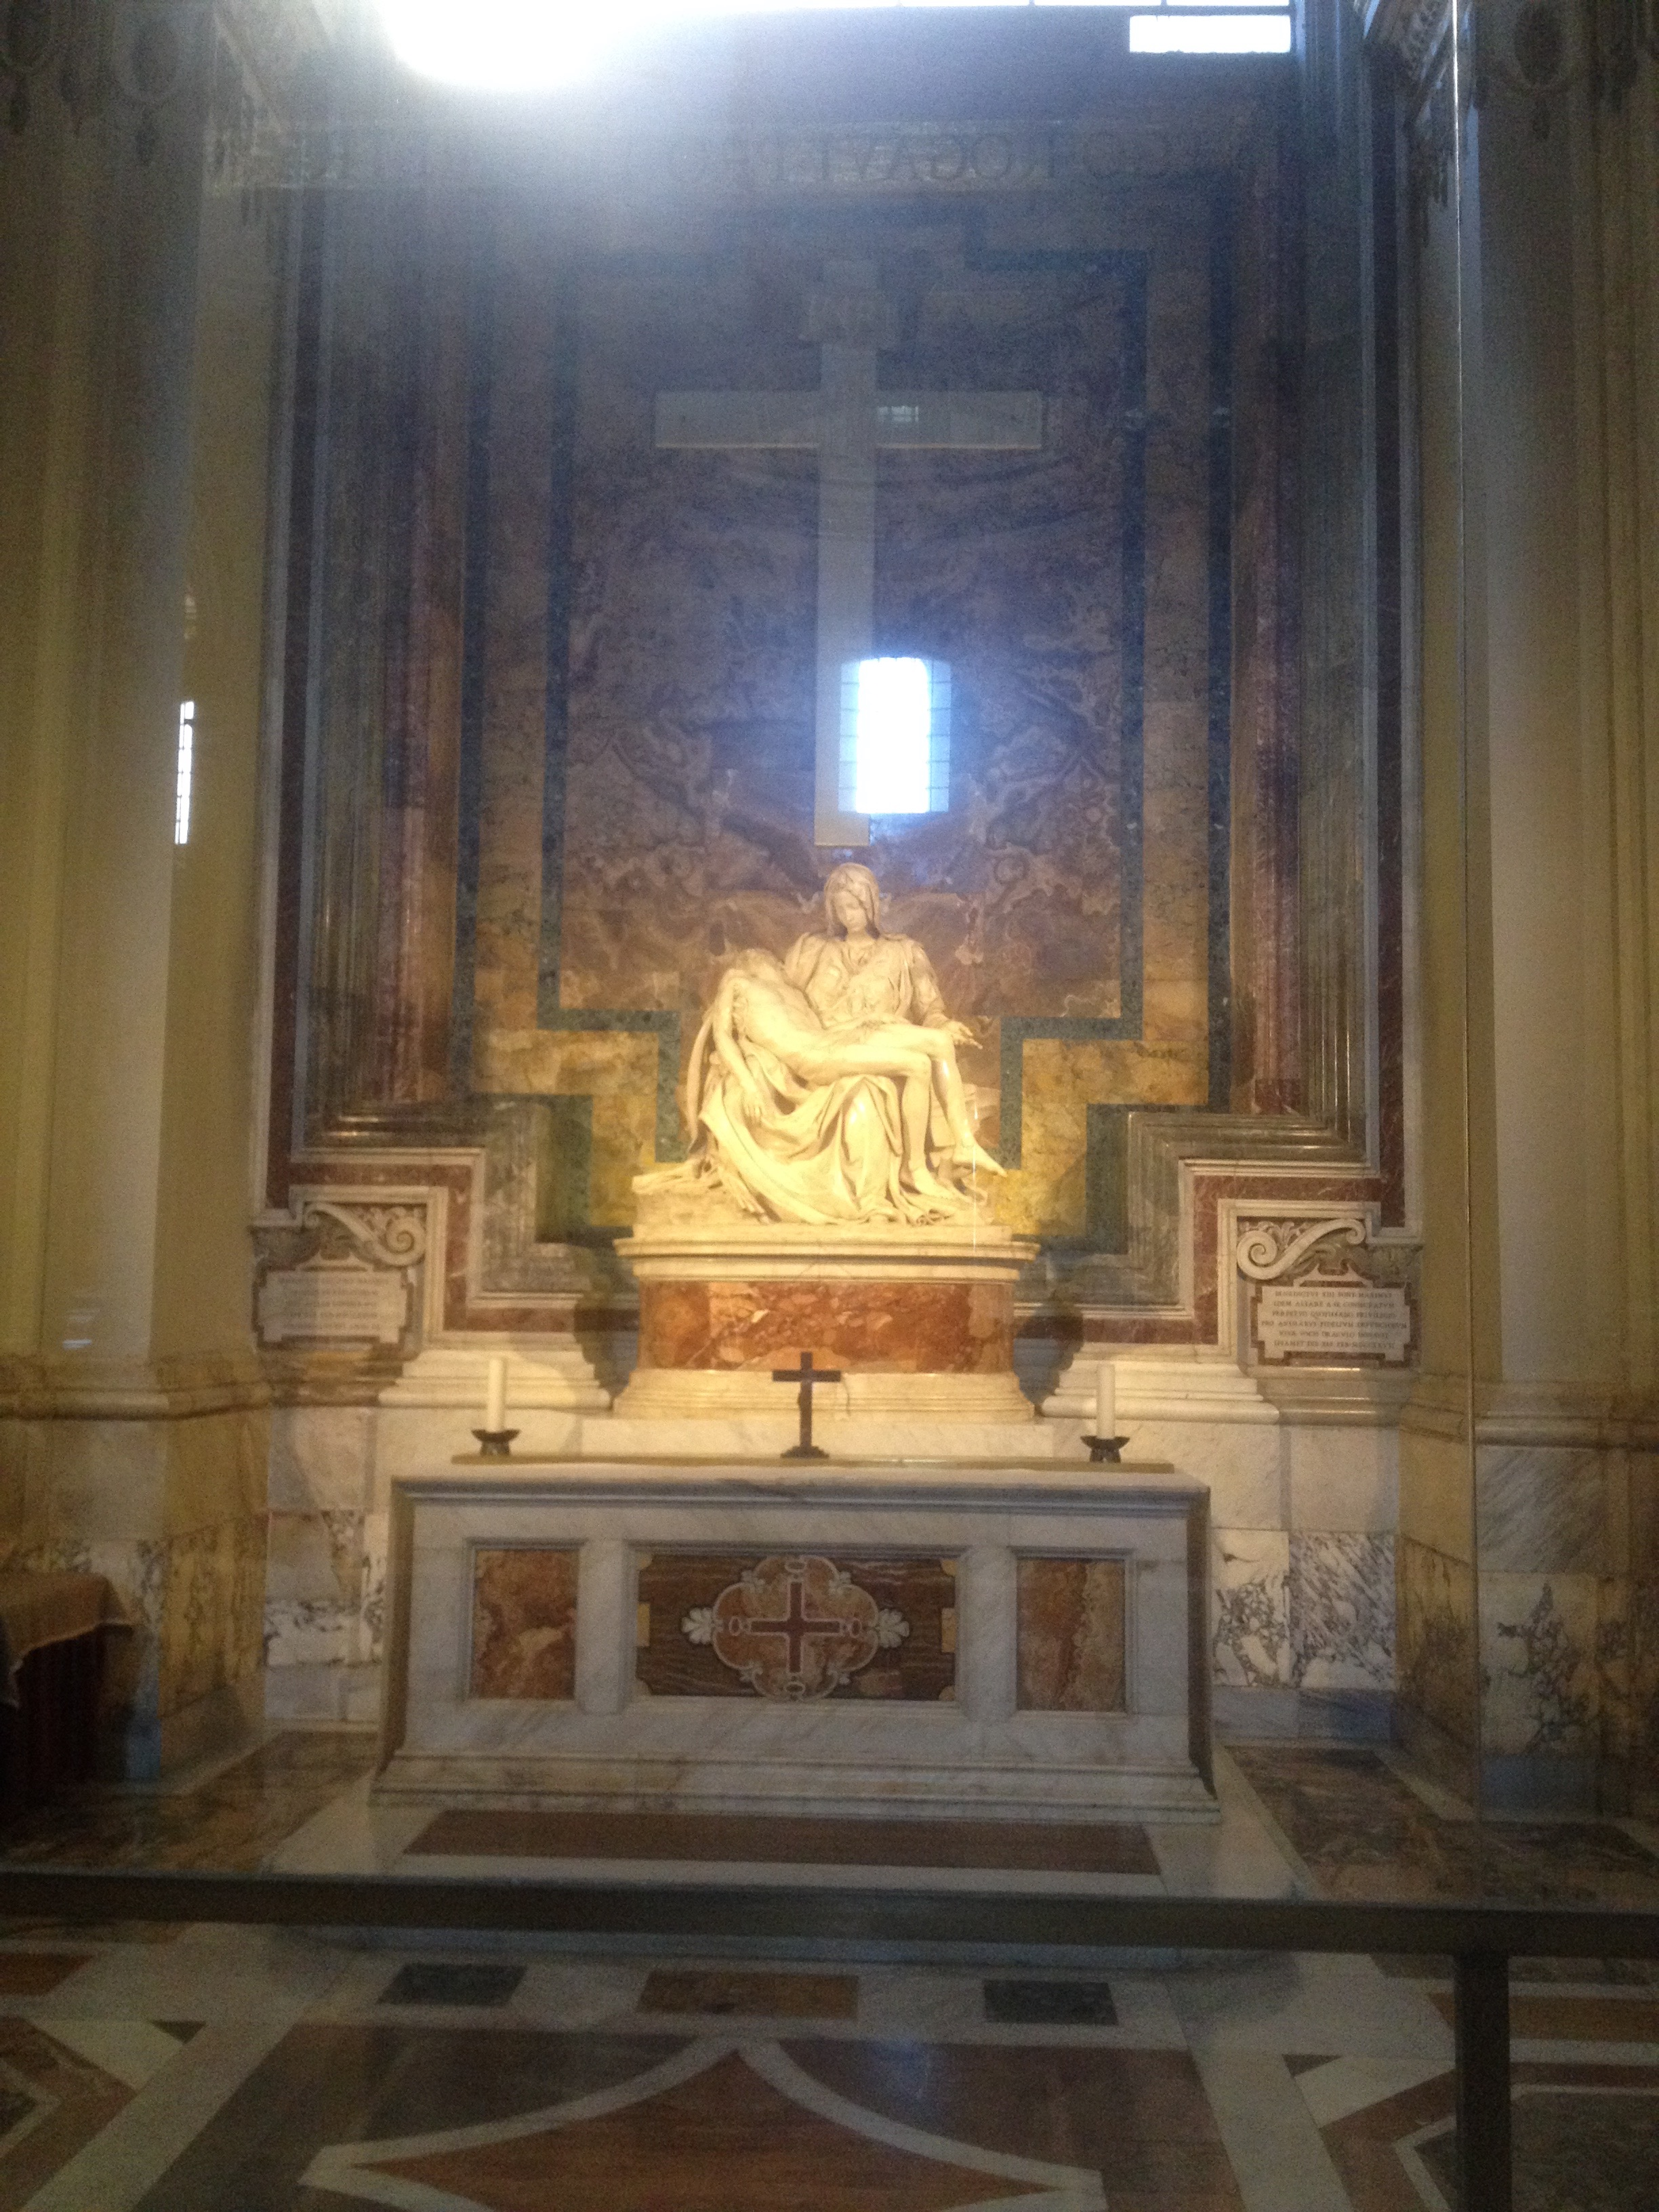 La Pieta by Michelangelo